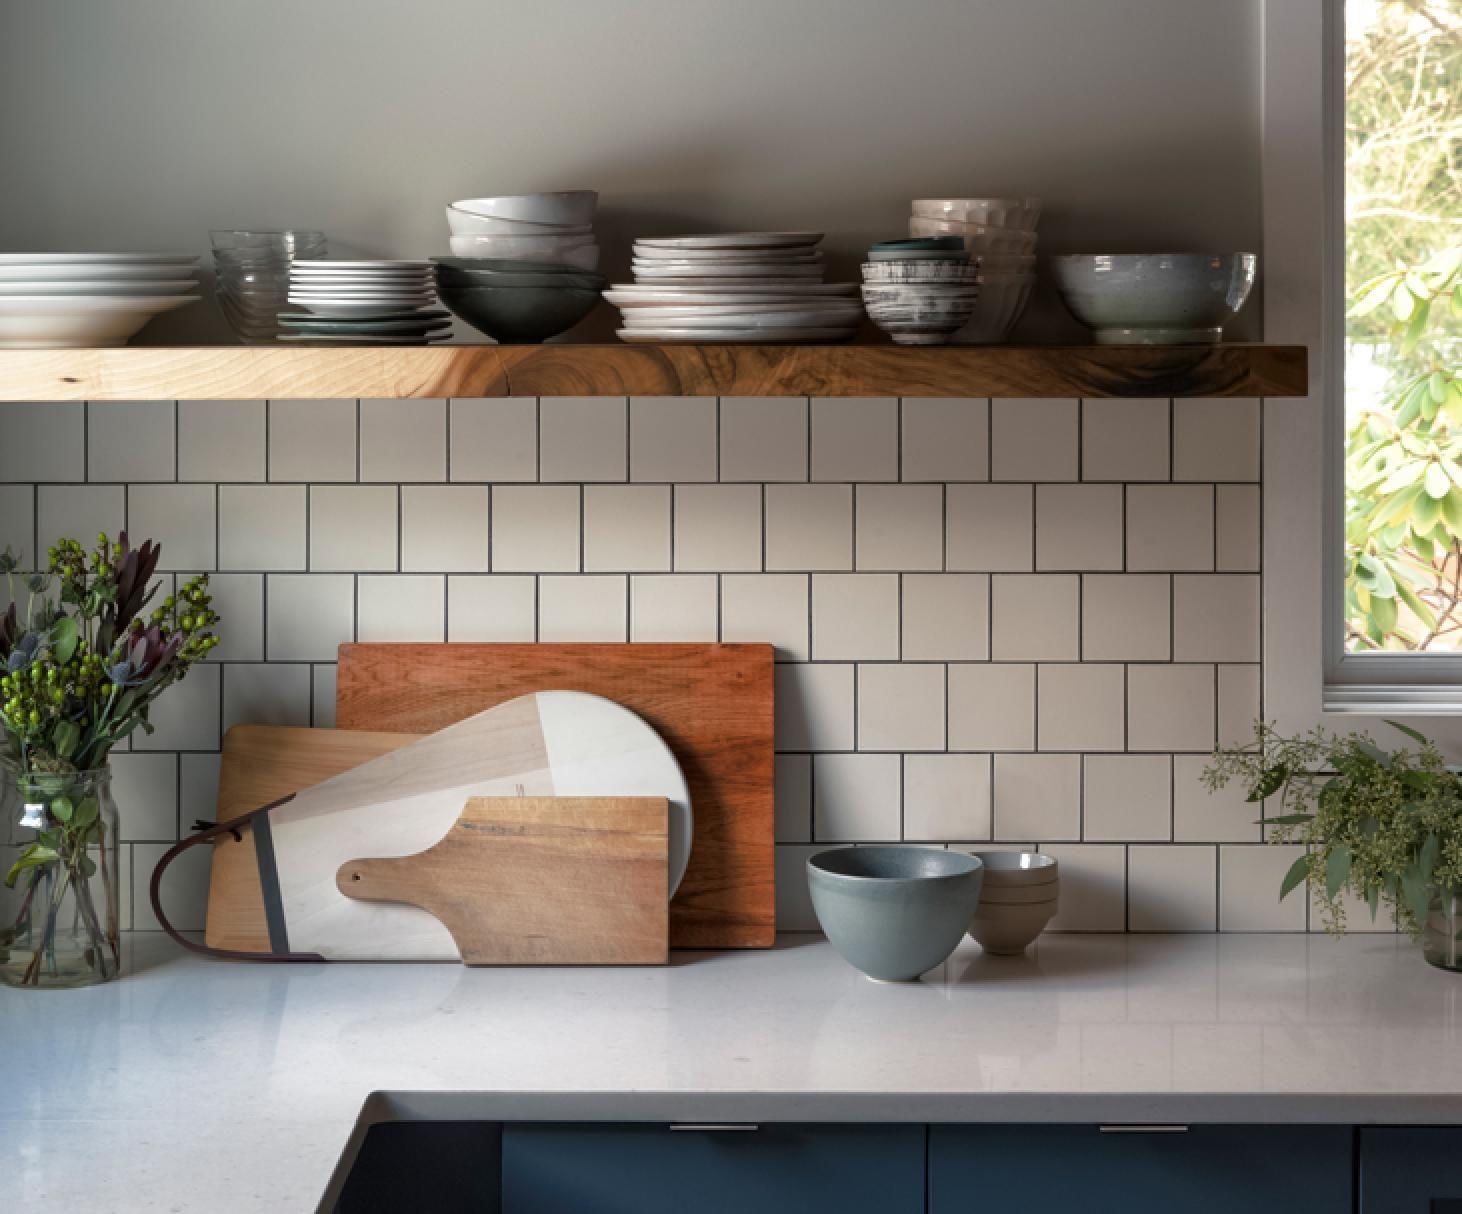 Heath ceramics tile in m3 parchment variation 4 in 4x4 for Kitchen design 4x4